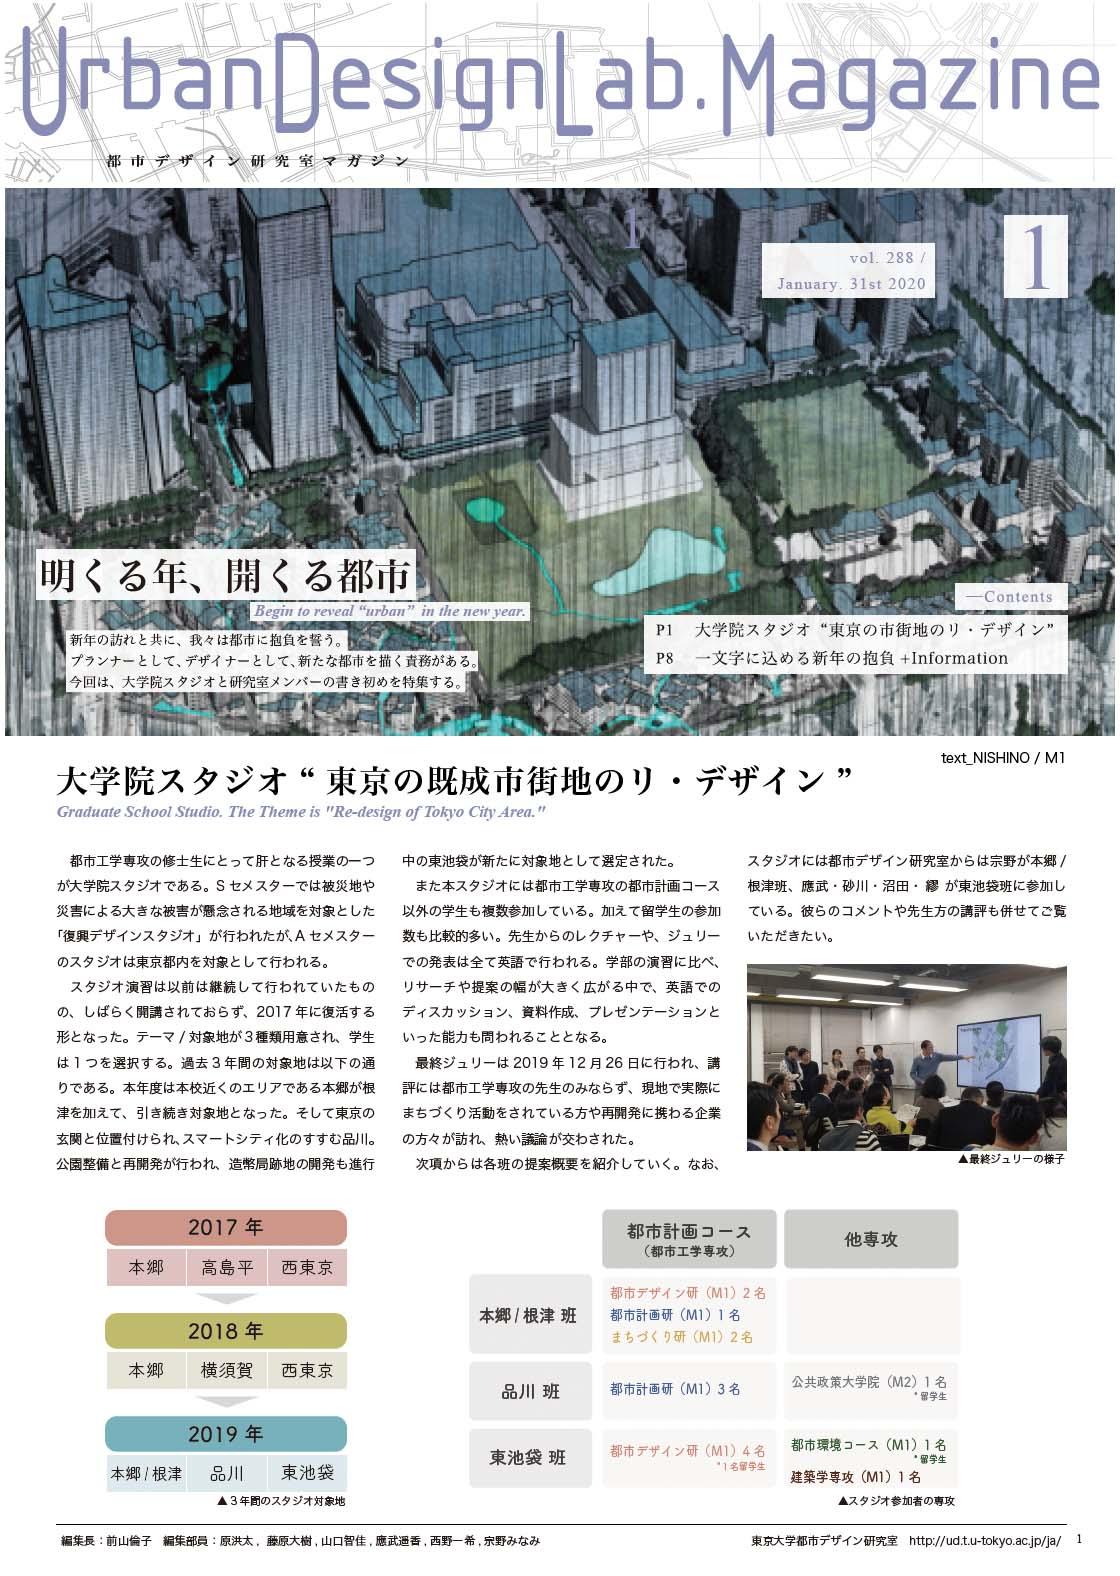 http://ud.t.u-tokyo.ac.jp/blog/_images/vol.288.jpg